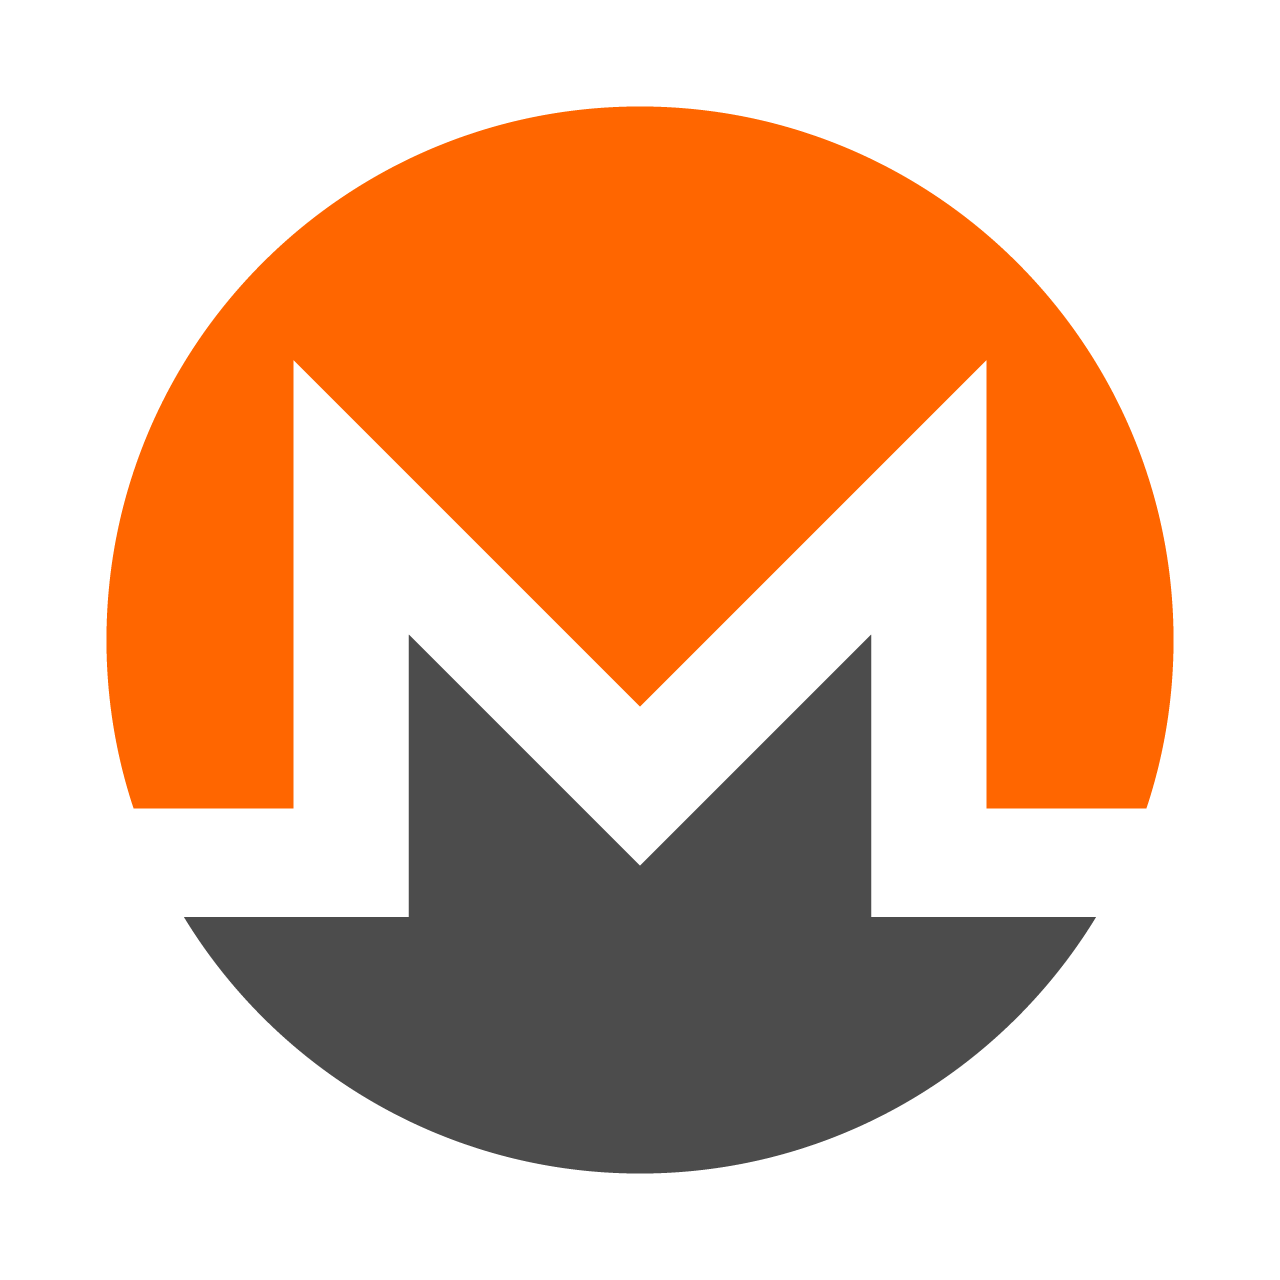 press-kit/symbols/monero-symbol-1280.png